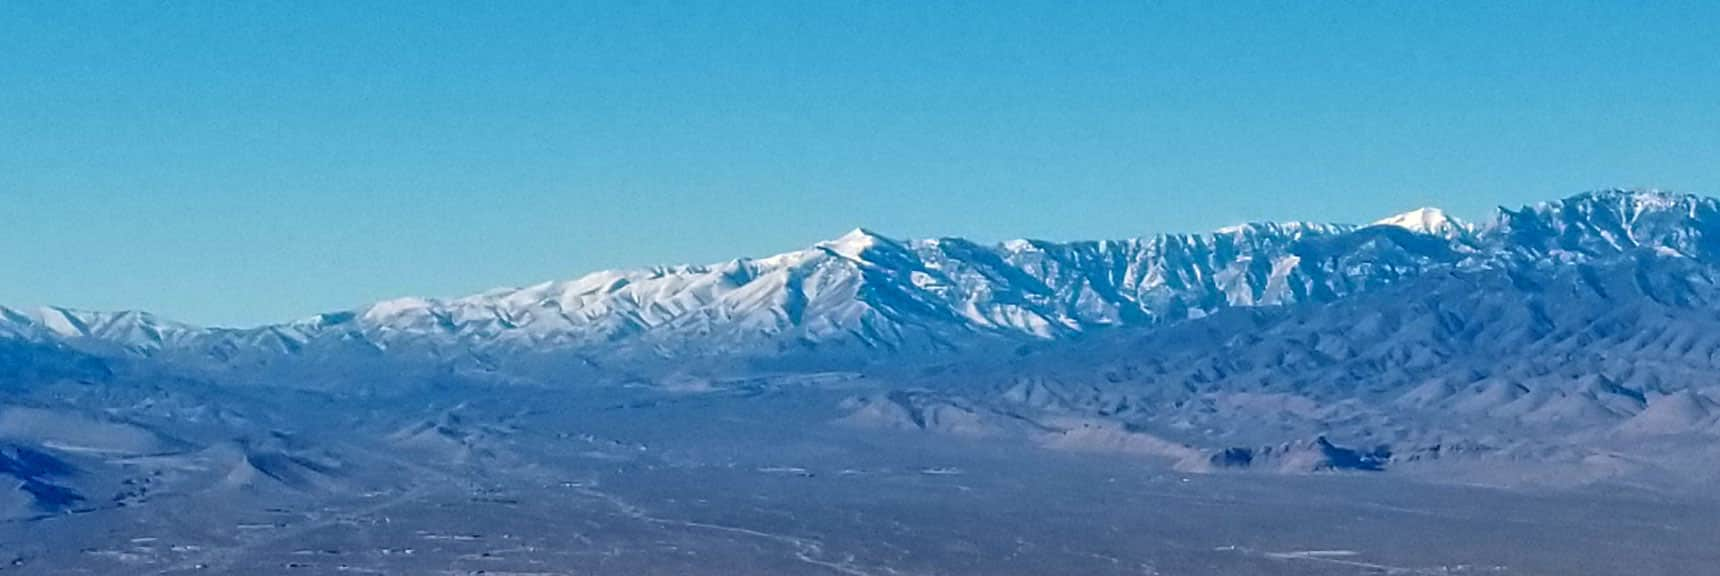 Griffith Peak Viewed from Gass Peak West Summit